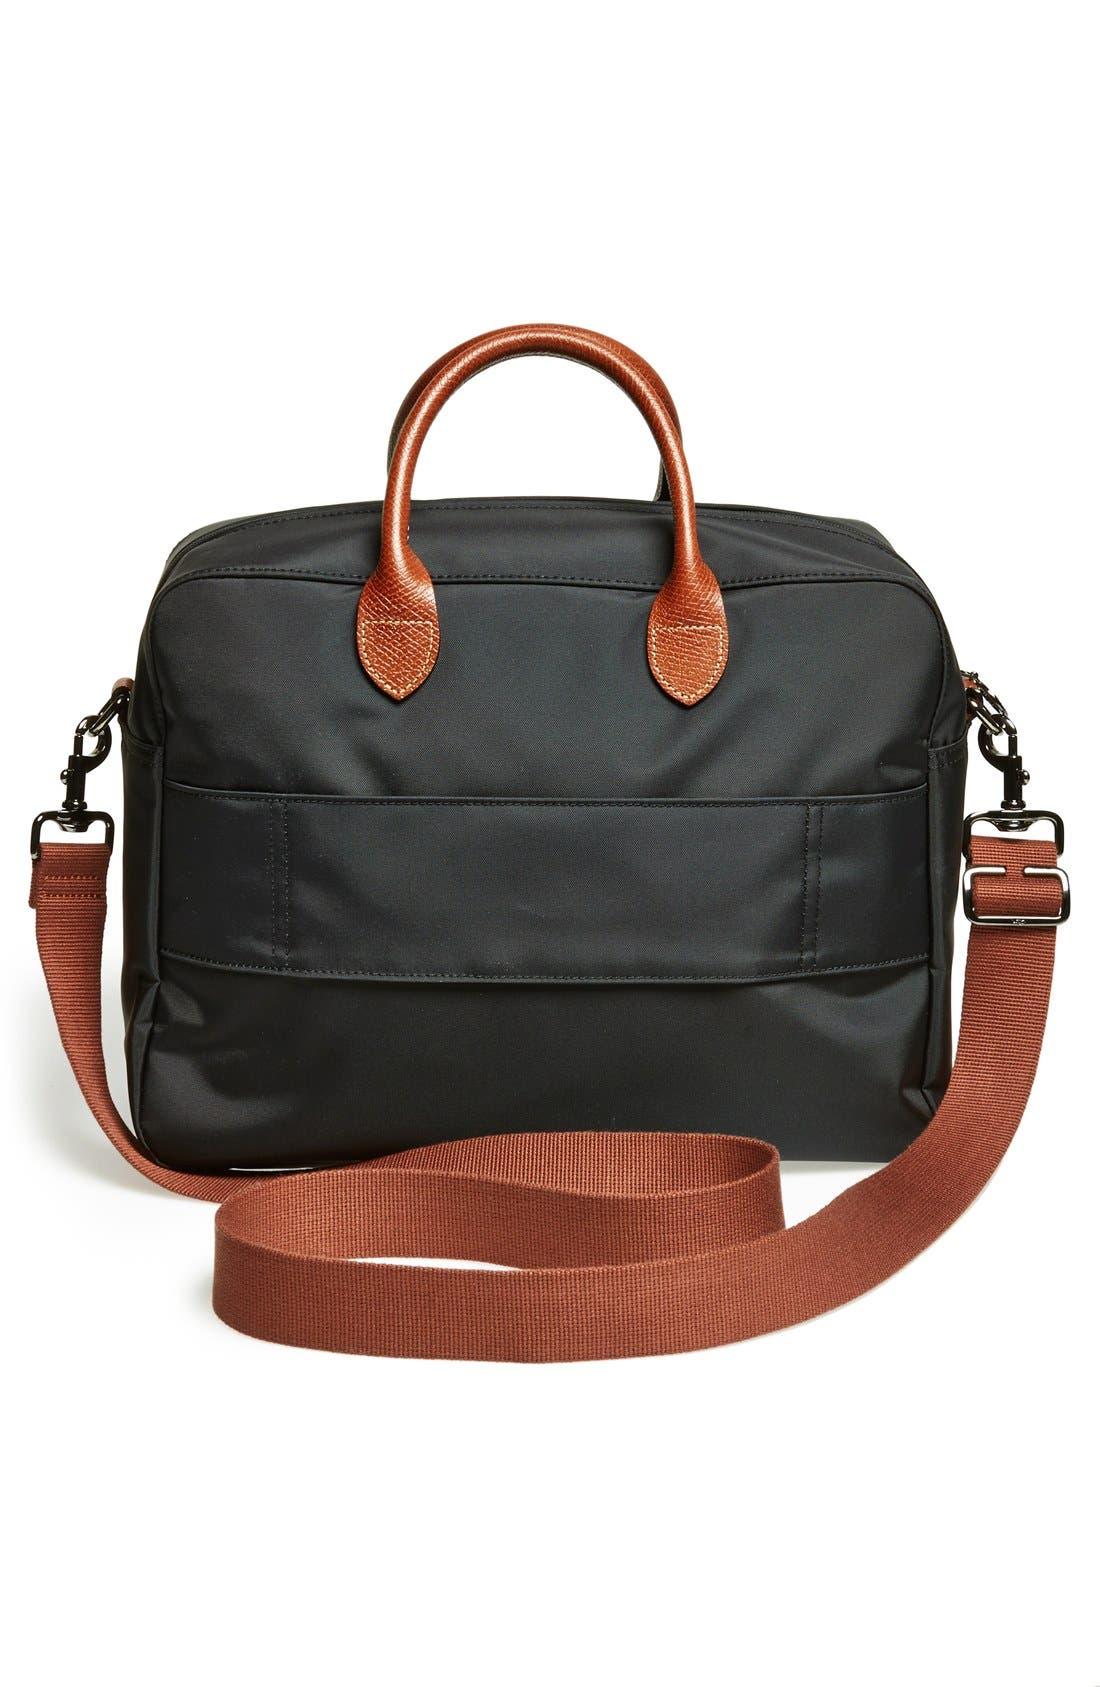 Alternate Image 3  - Longchamp 'Le Pliage' Travel Bag (14 Inch)